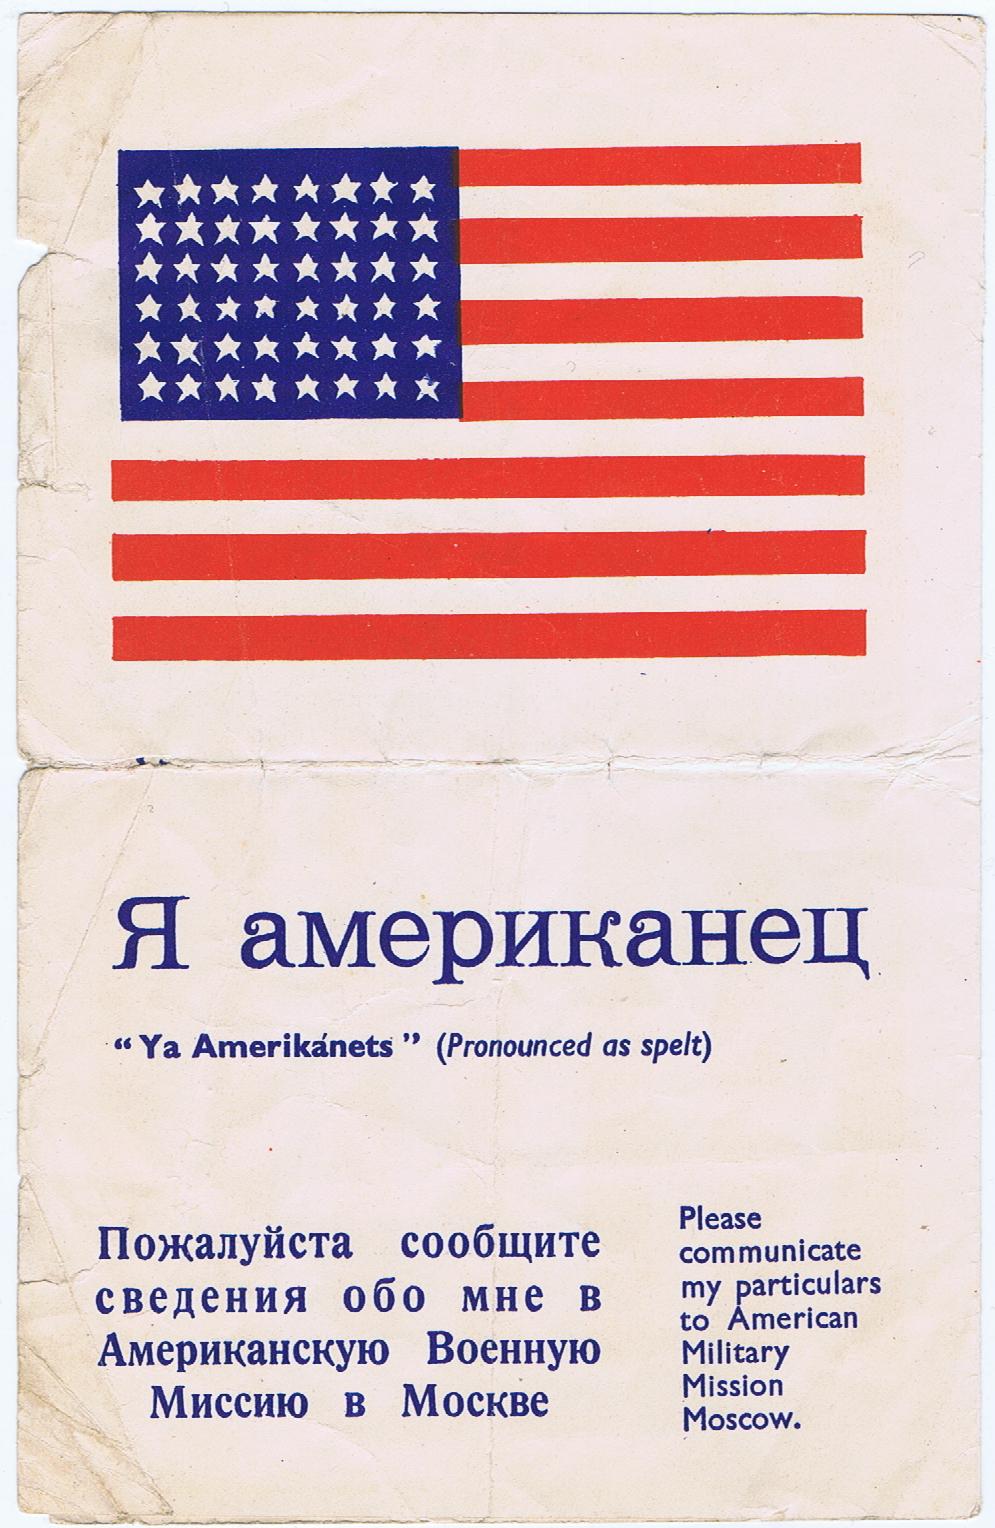 J939AMERICAN G.I. ID FOR RUSSIANS